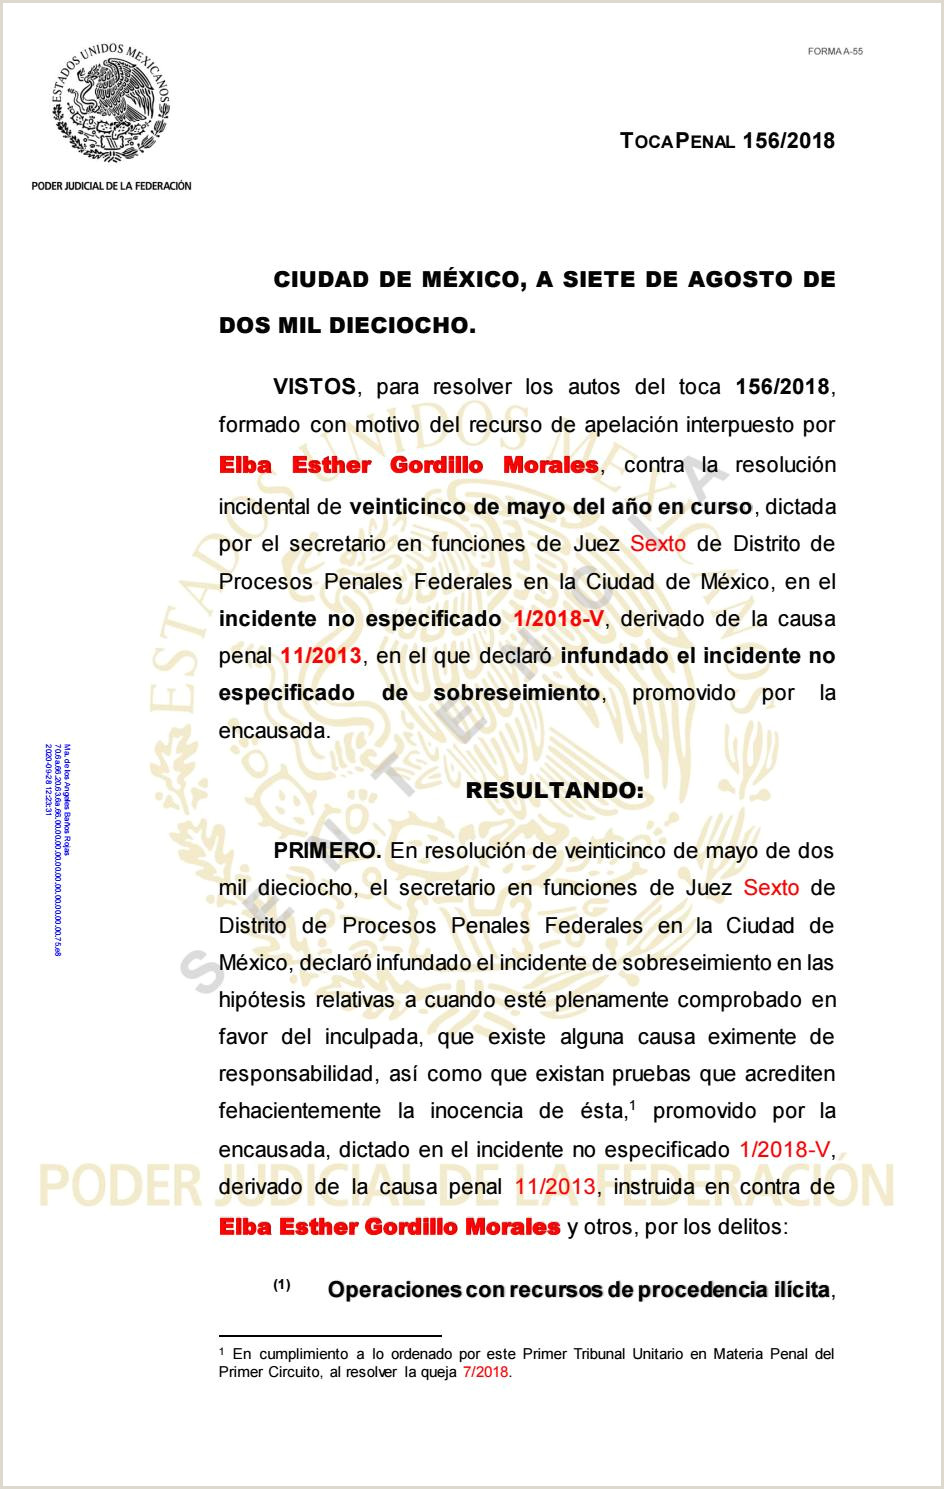 Formato Unico De Hoja De Vida Minerva Para Diligenciar Sentencia Elba Esther Gordillo Morales by La Silla Rota issuu